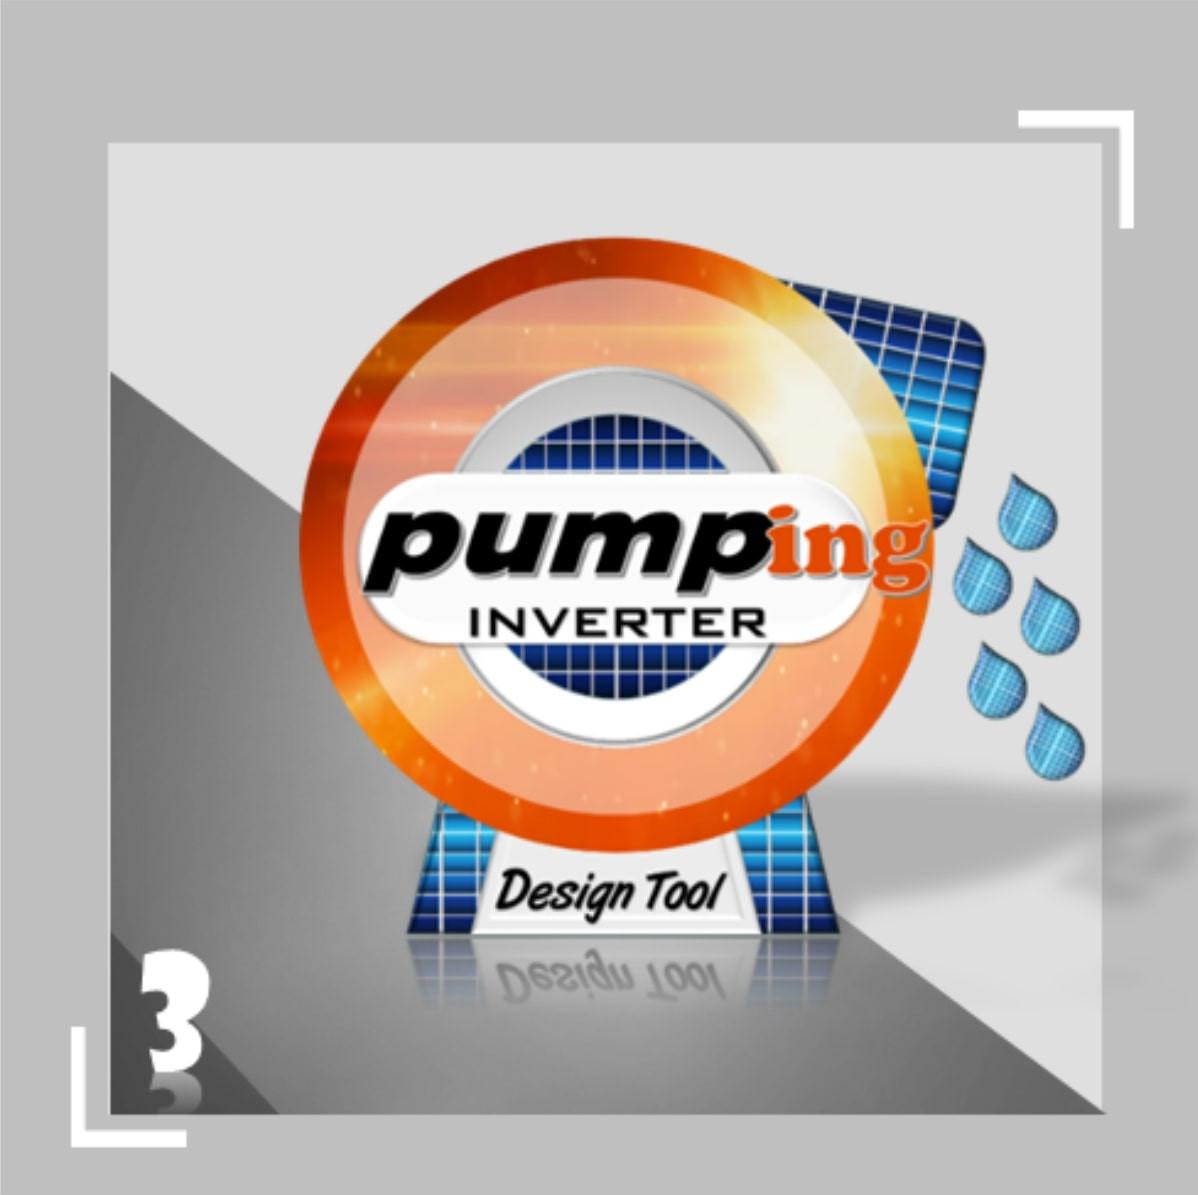 SM Pumping designer tool